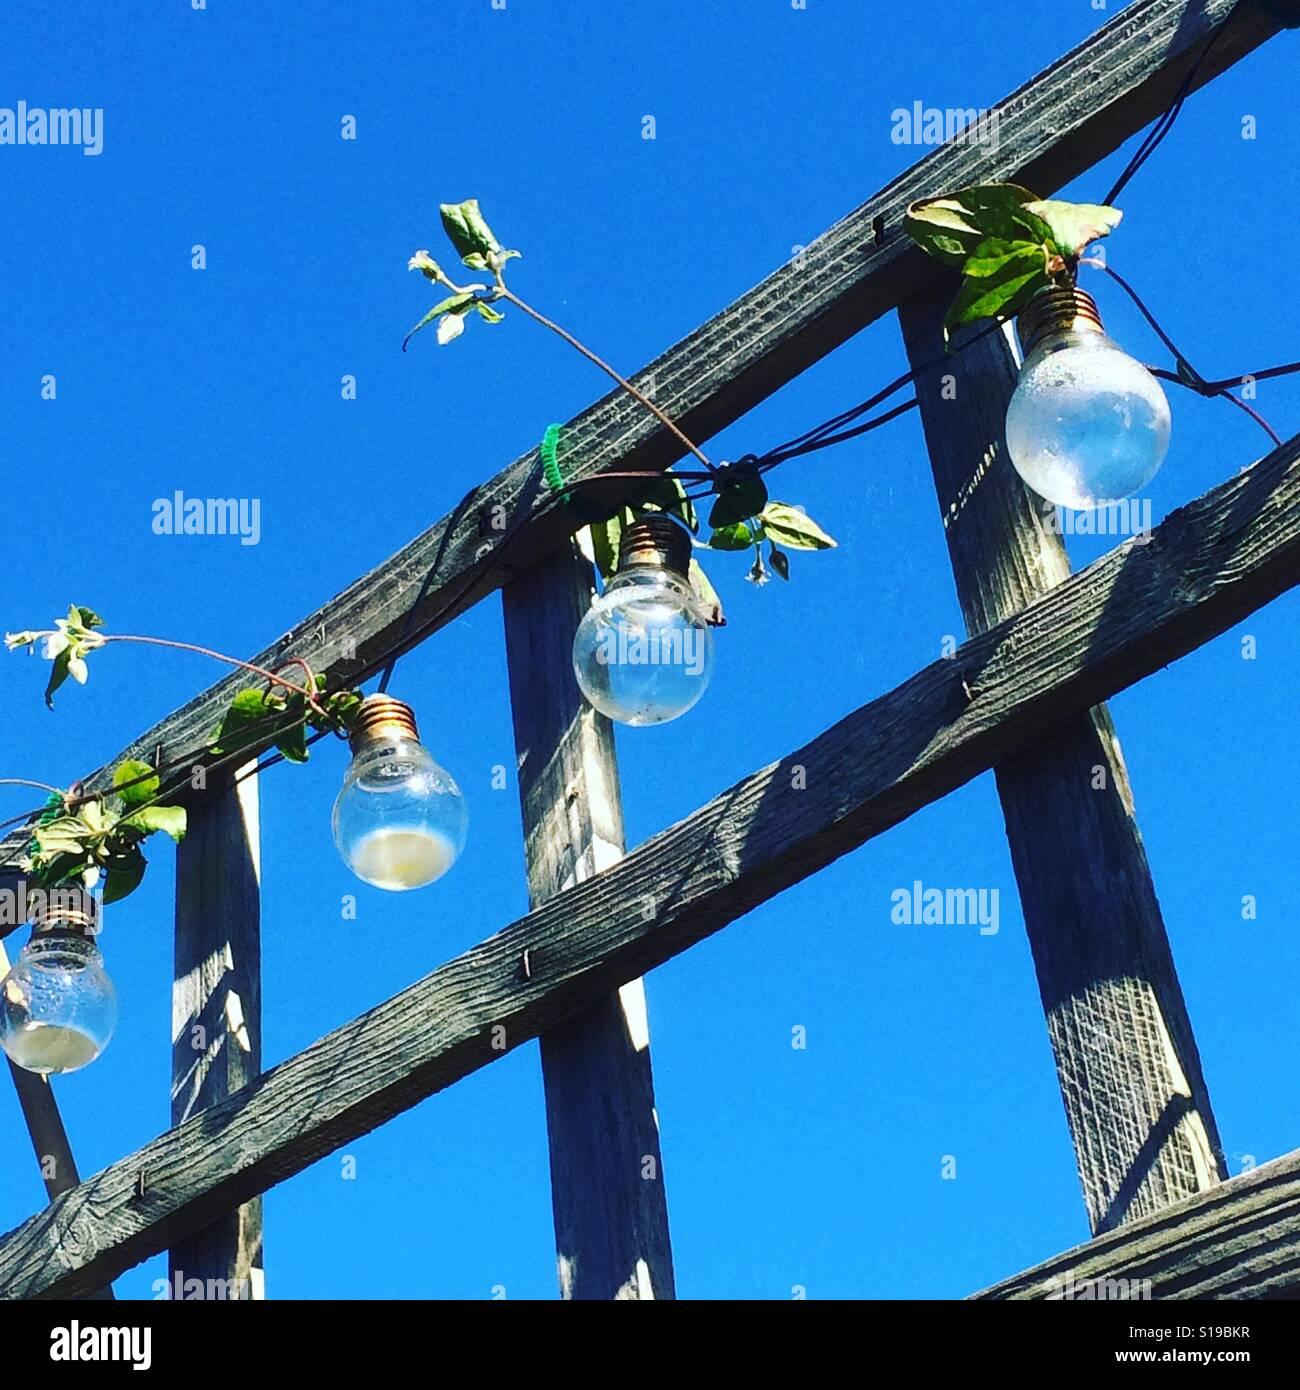 Garden lights - Stock Image